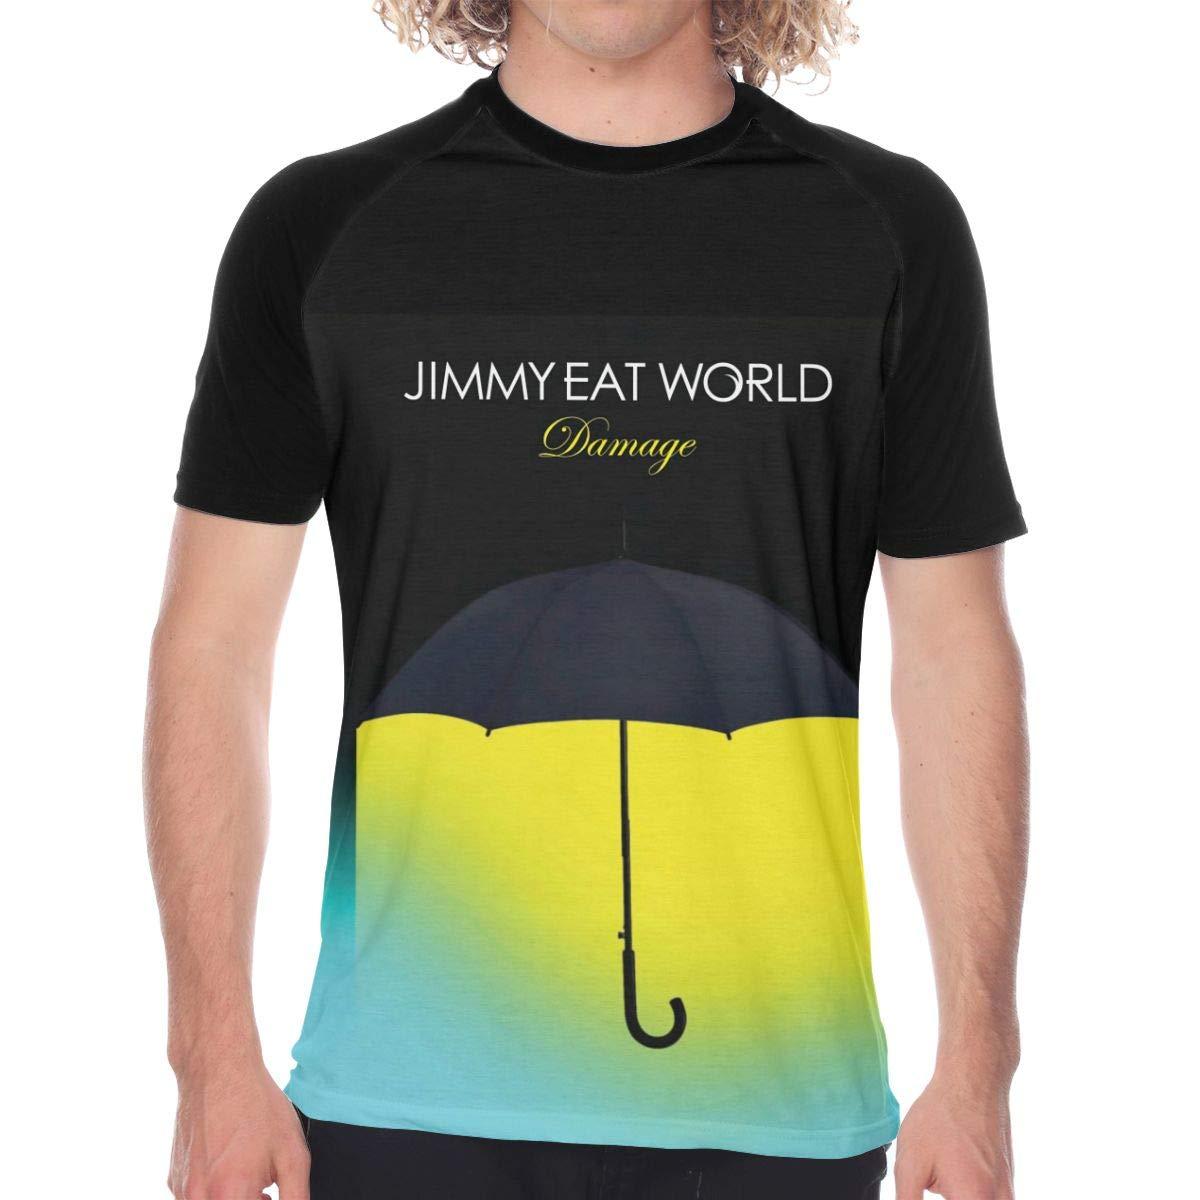 FwadGacx Jimmy Eat World Men Youth Stylish Short Sleeves Full Size Printed Baseball Tee Gift